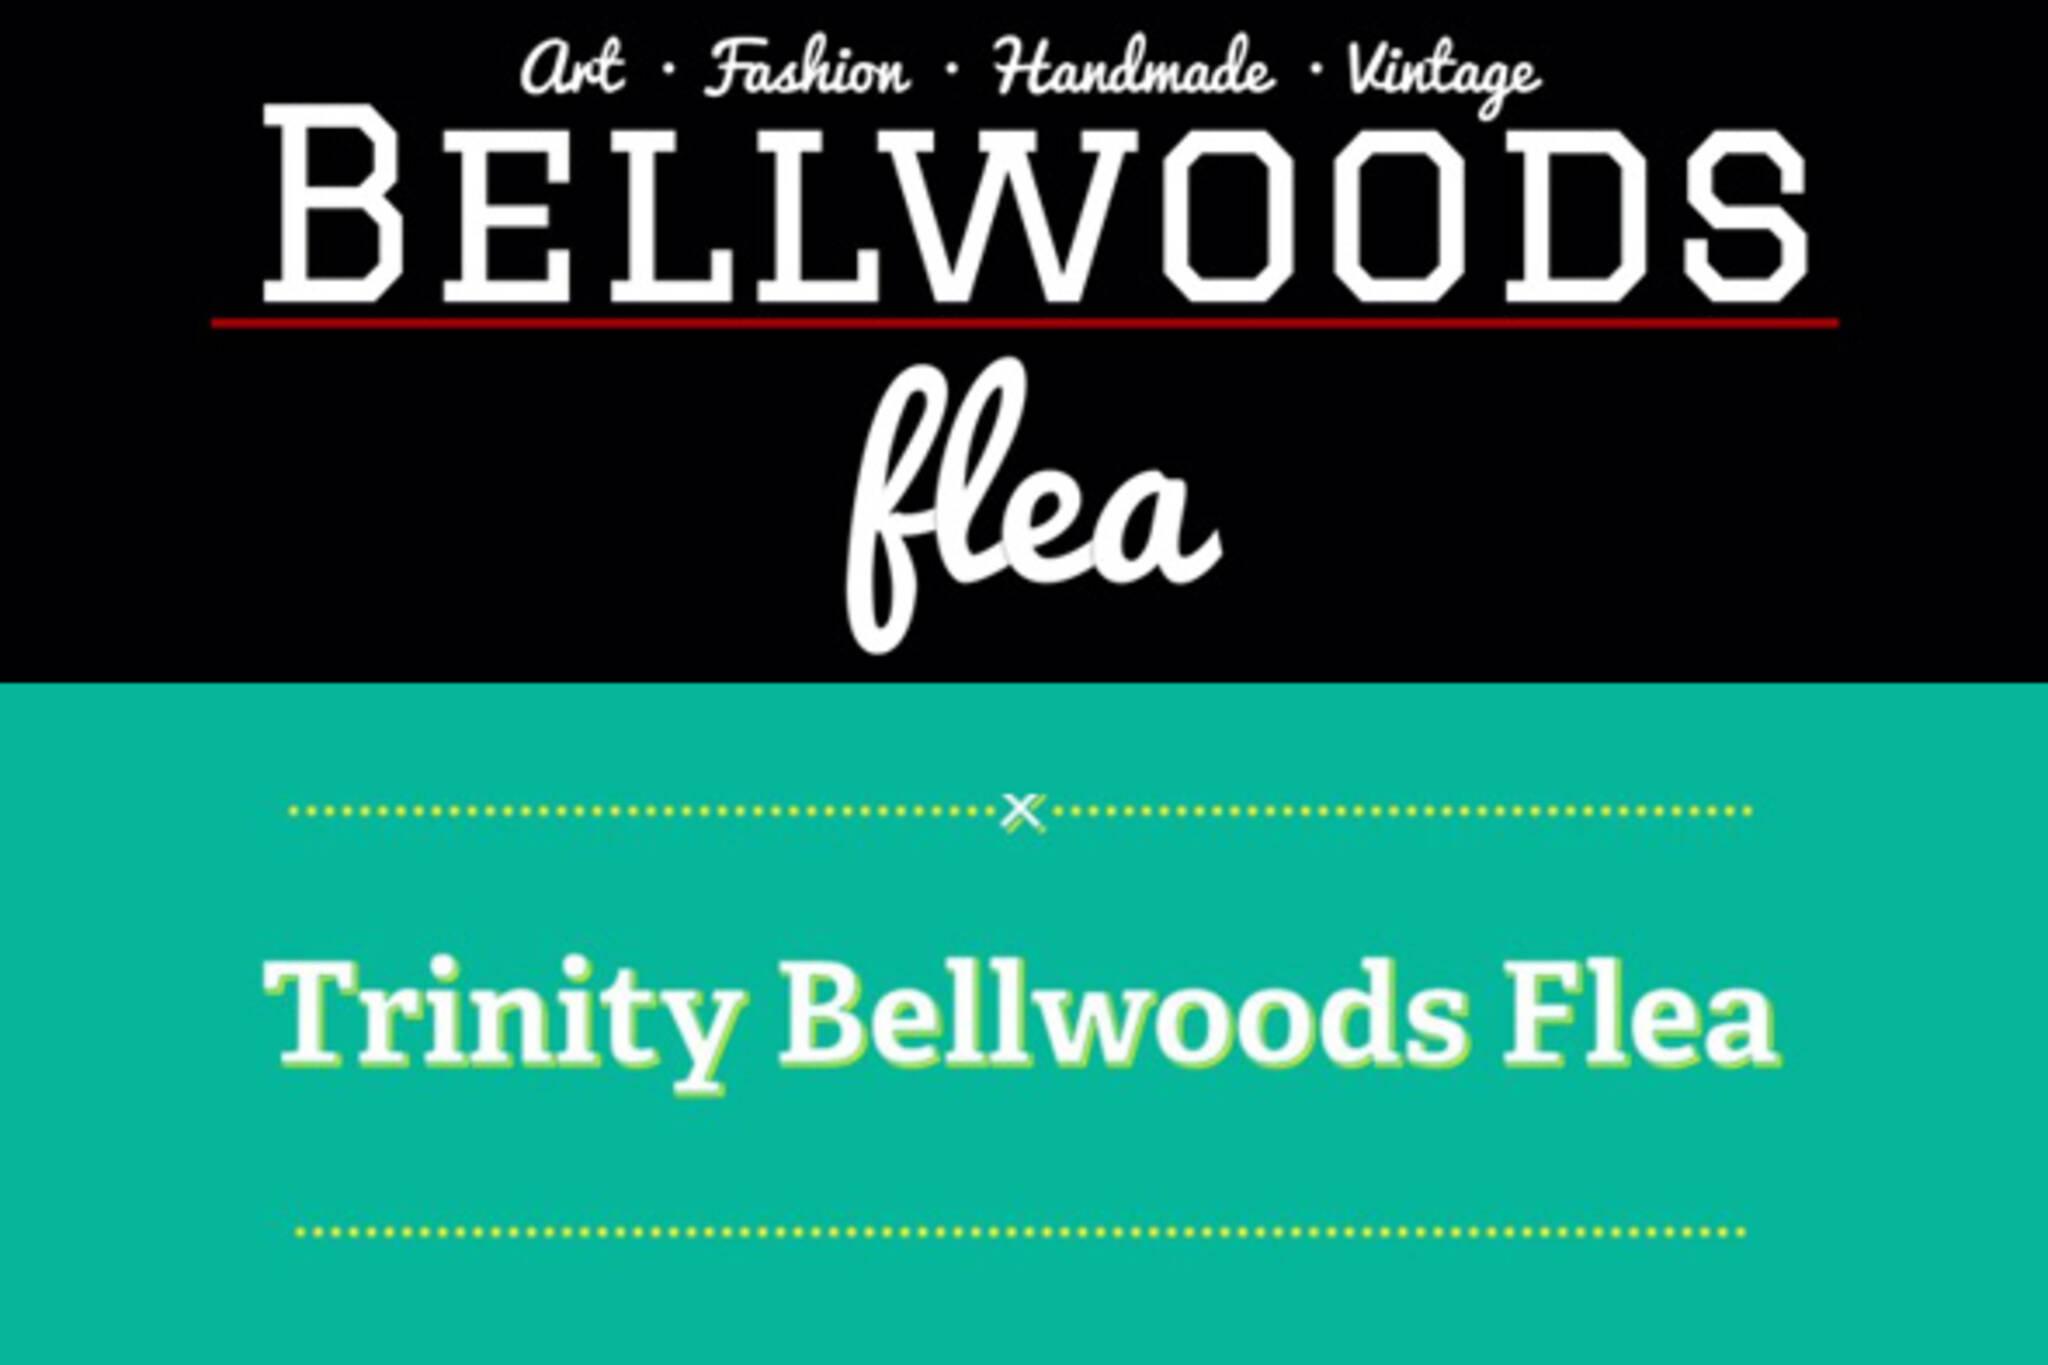 bellwoods flea